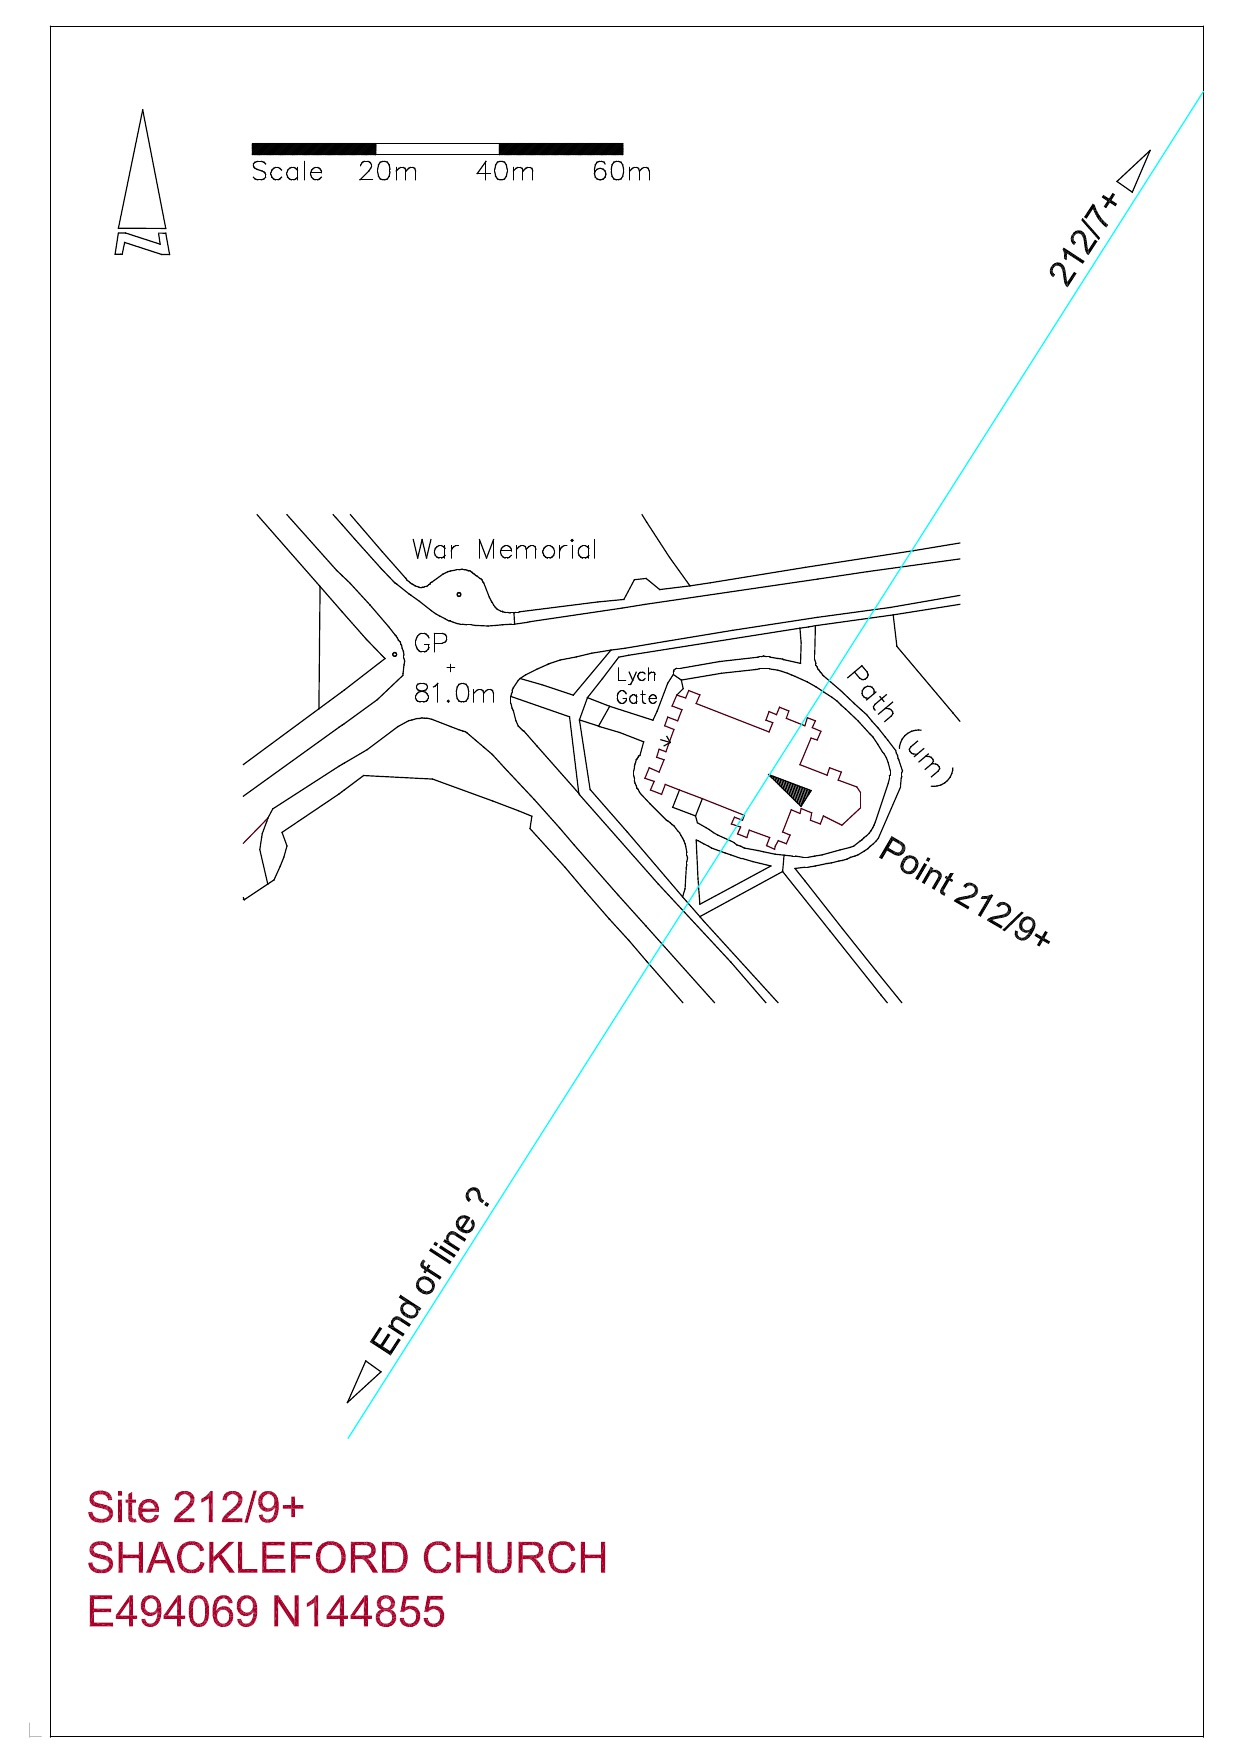 Site plan Shackleford Church